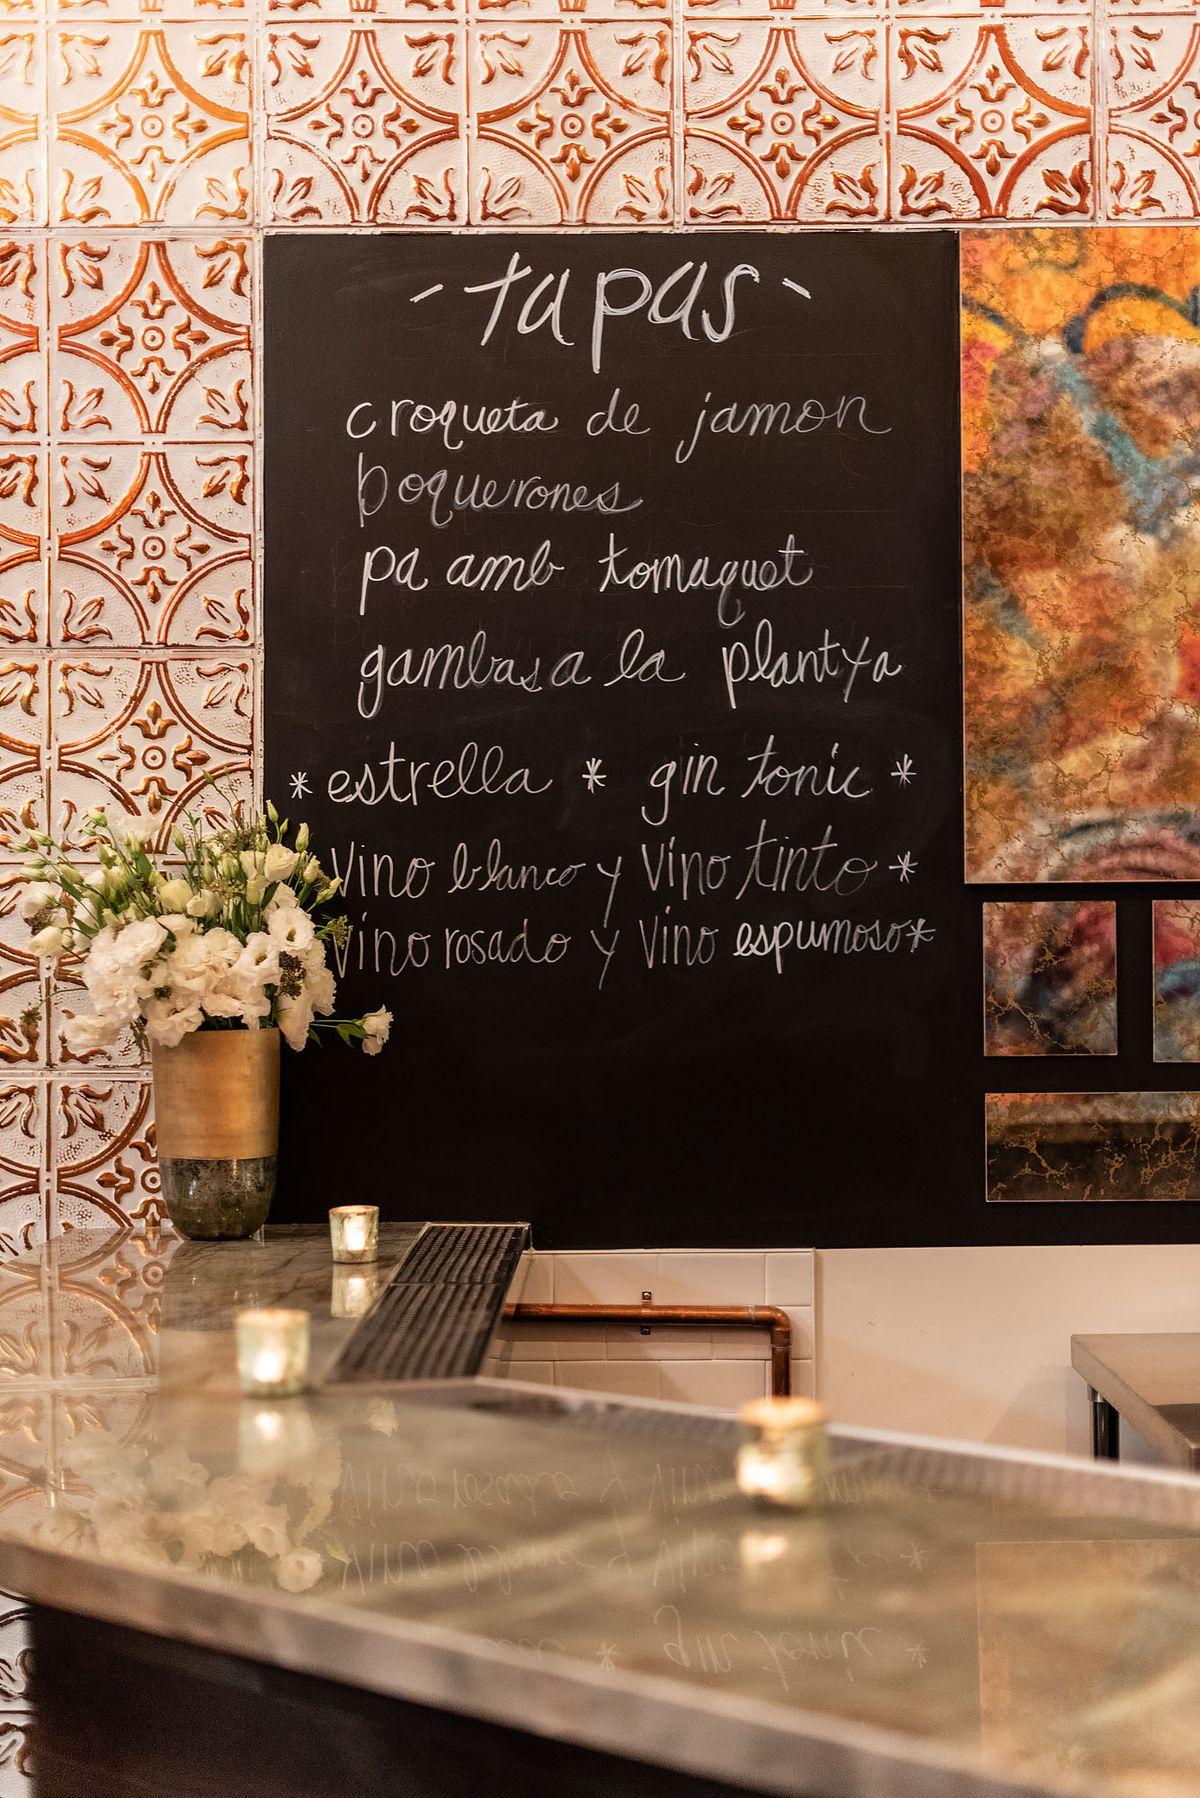 Tapas menu at Otoño